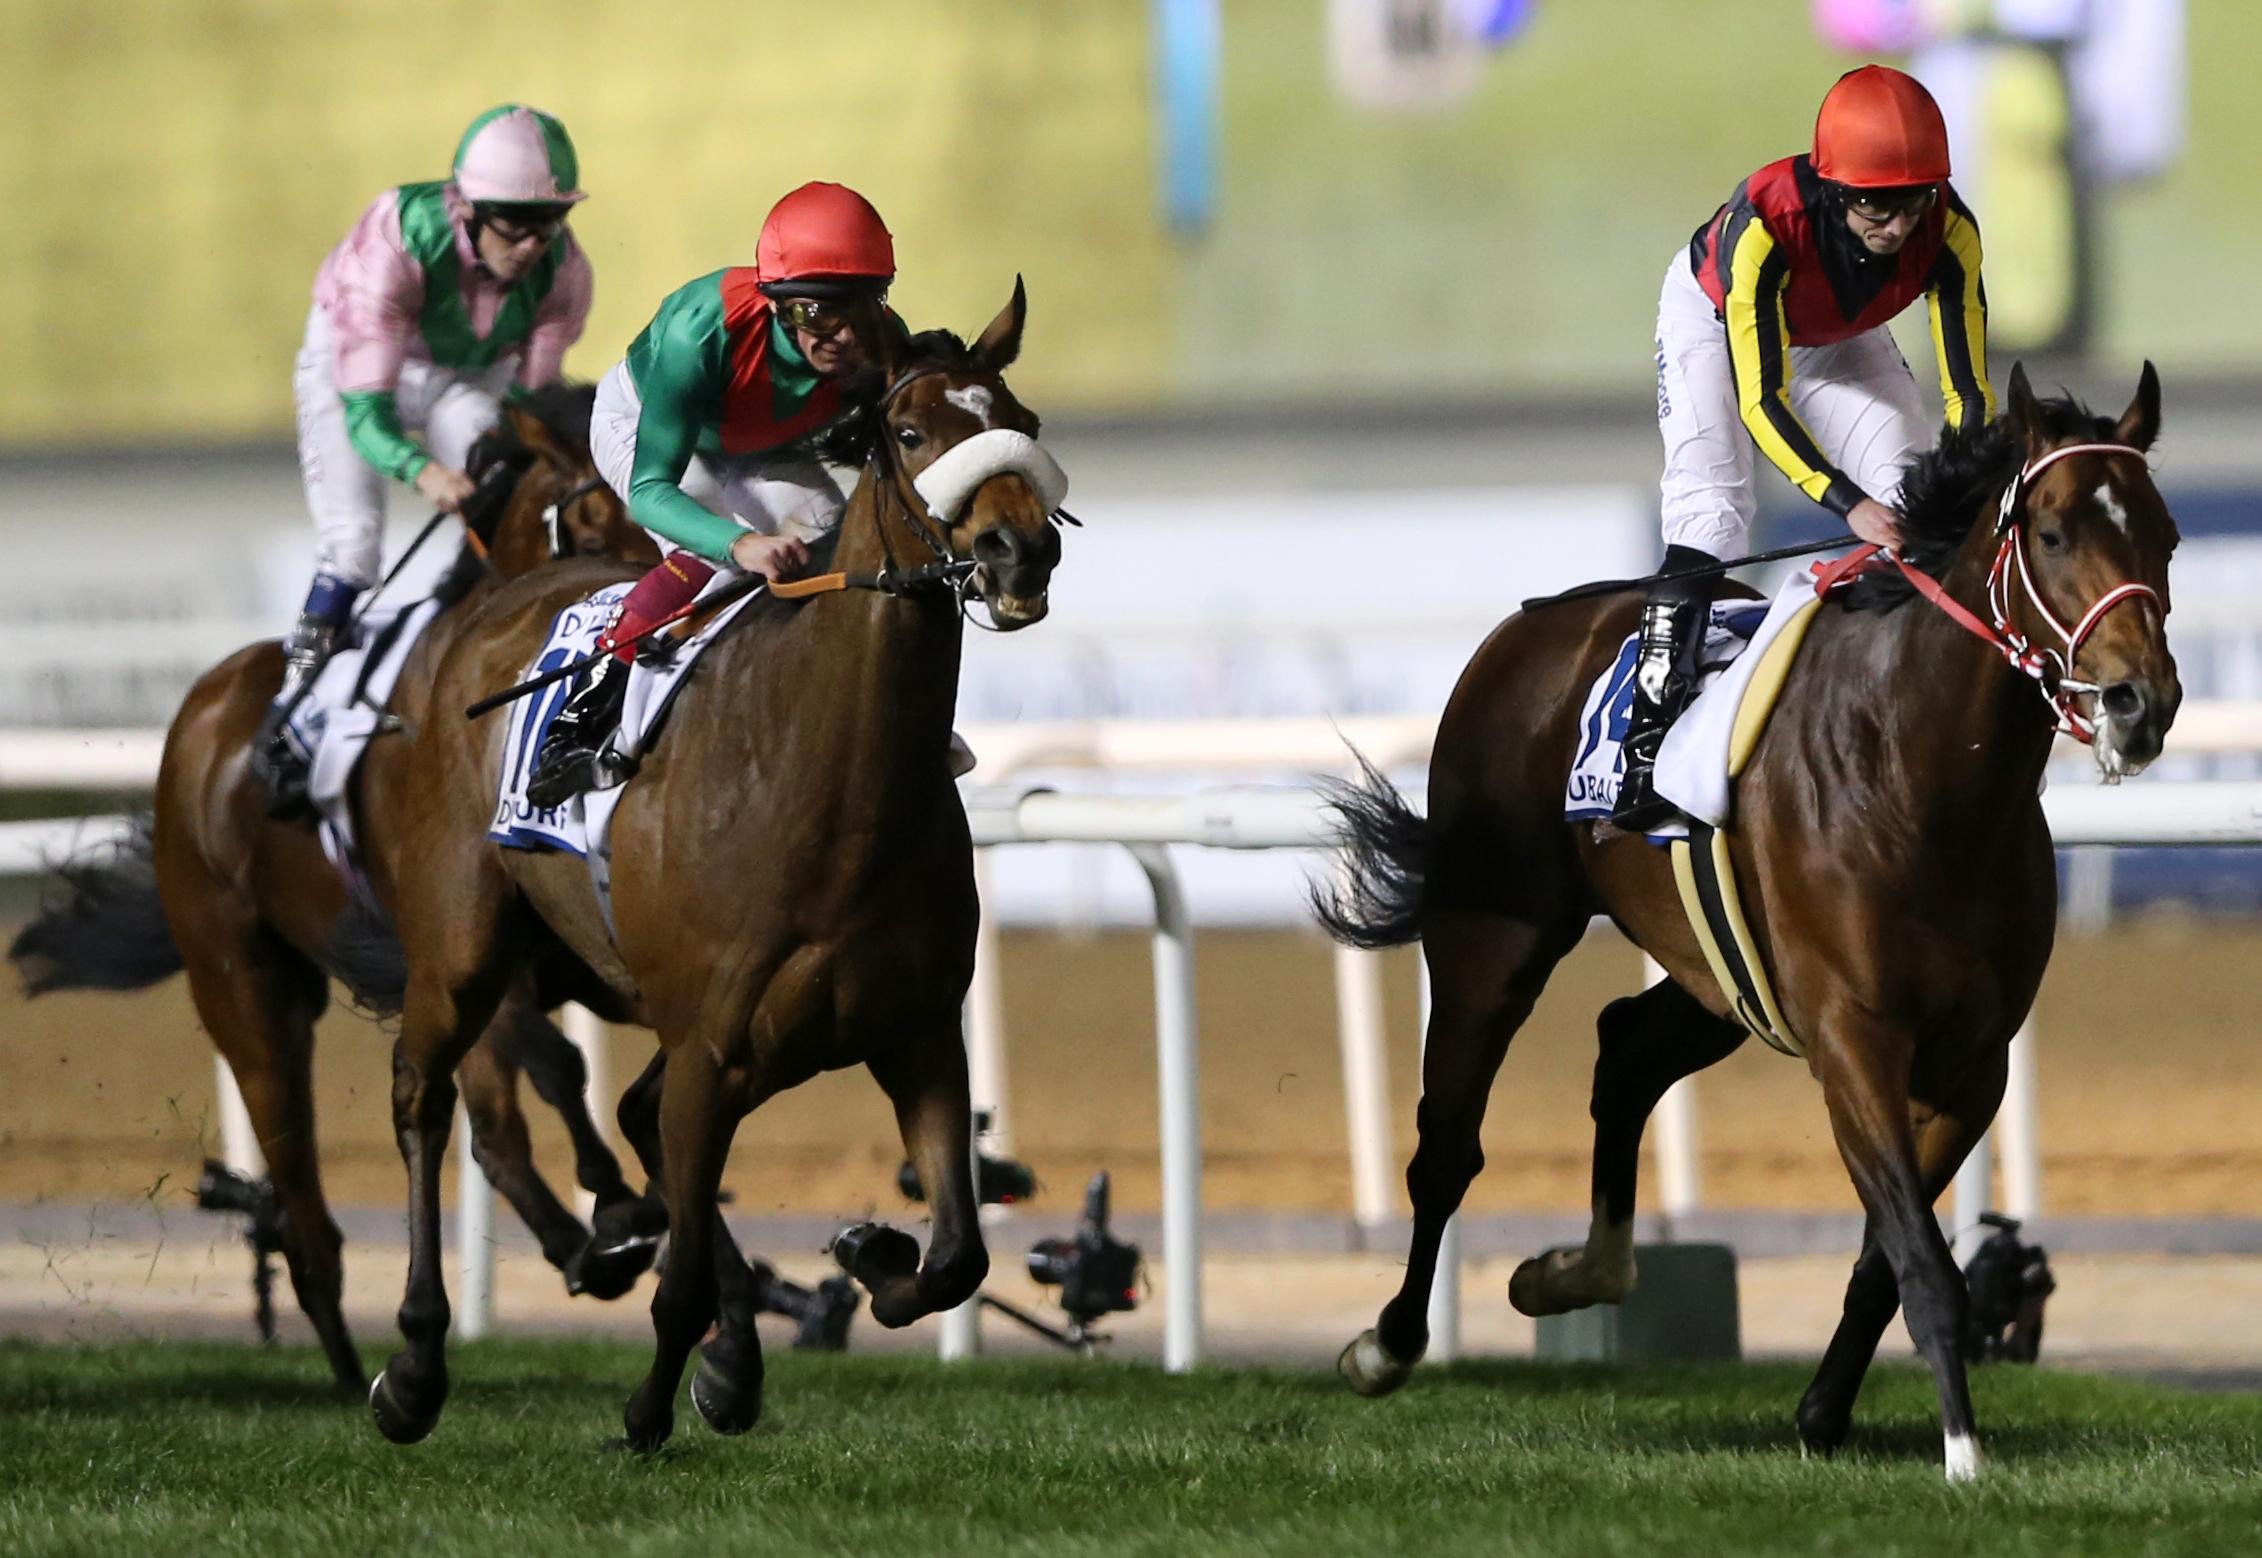 Japanese horse Real Steel ridden by Ryan Moore crosses the finish line to win the U.S. $ 6,000,000 Dubai Turf of the Dubai World Cup horse racing at the Meydan Racecourse in Dubai, United Arab Emirates, Saturday, March 26, 2016.  (AP Photo/Kamran Jebreili